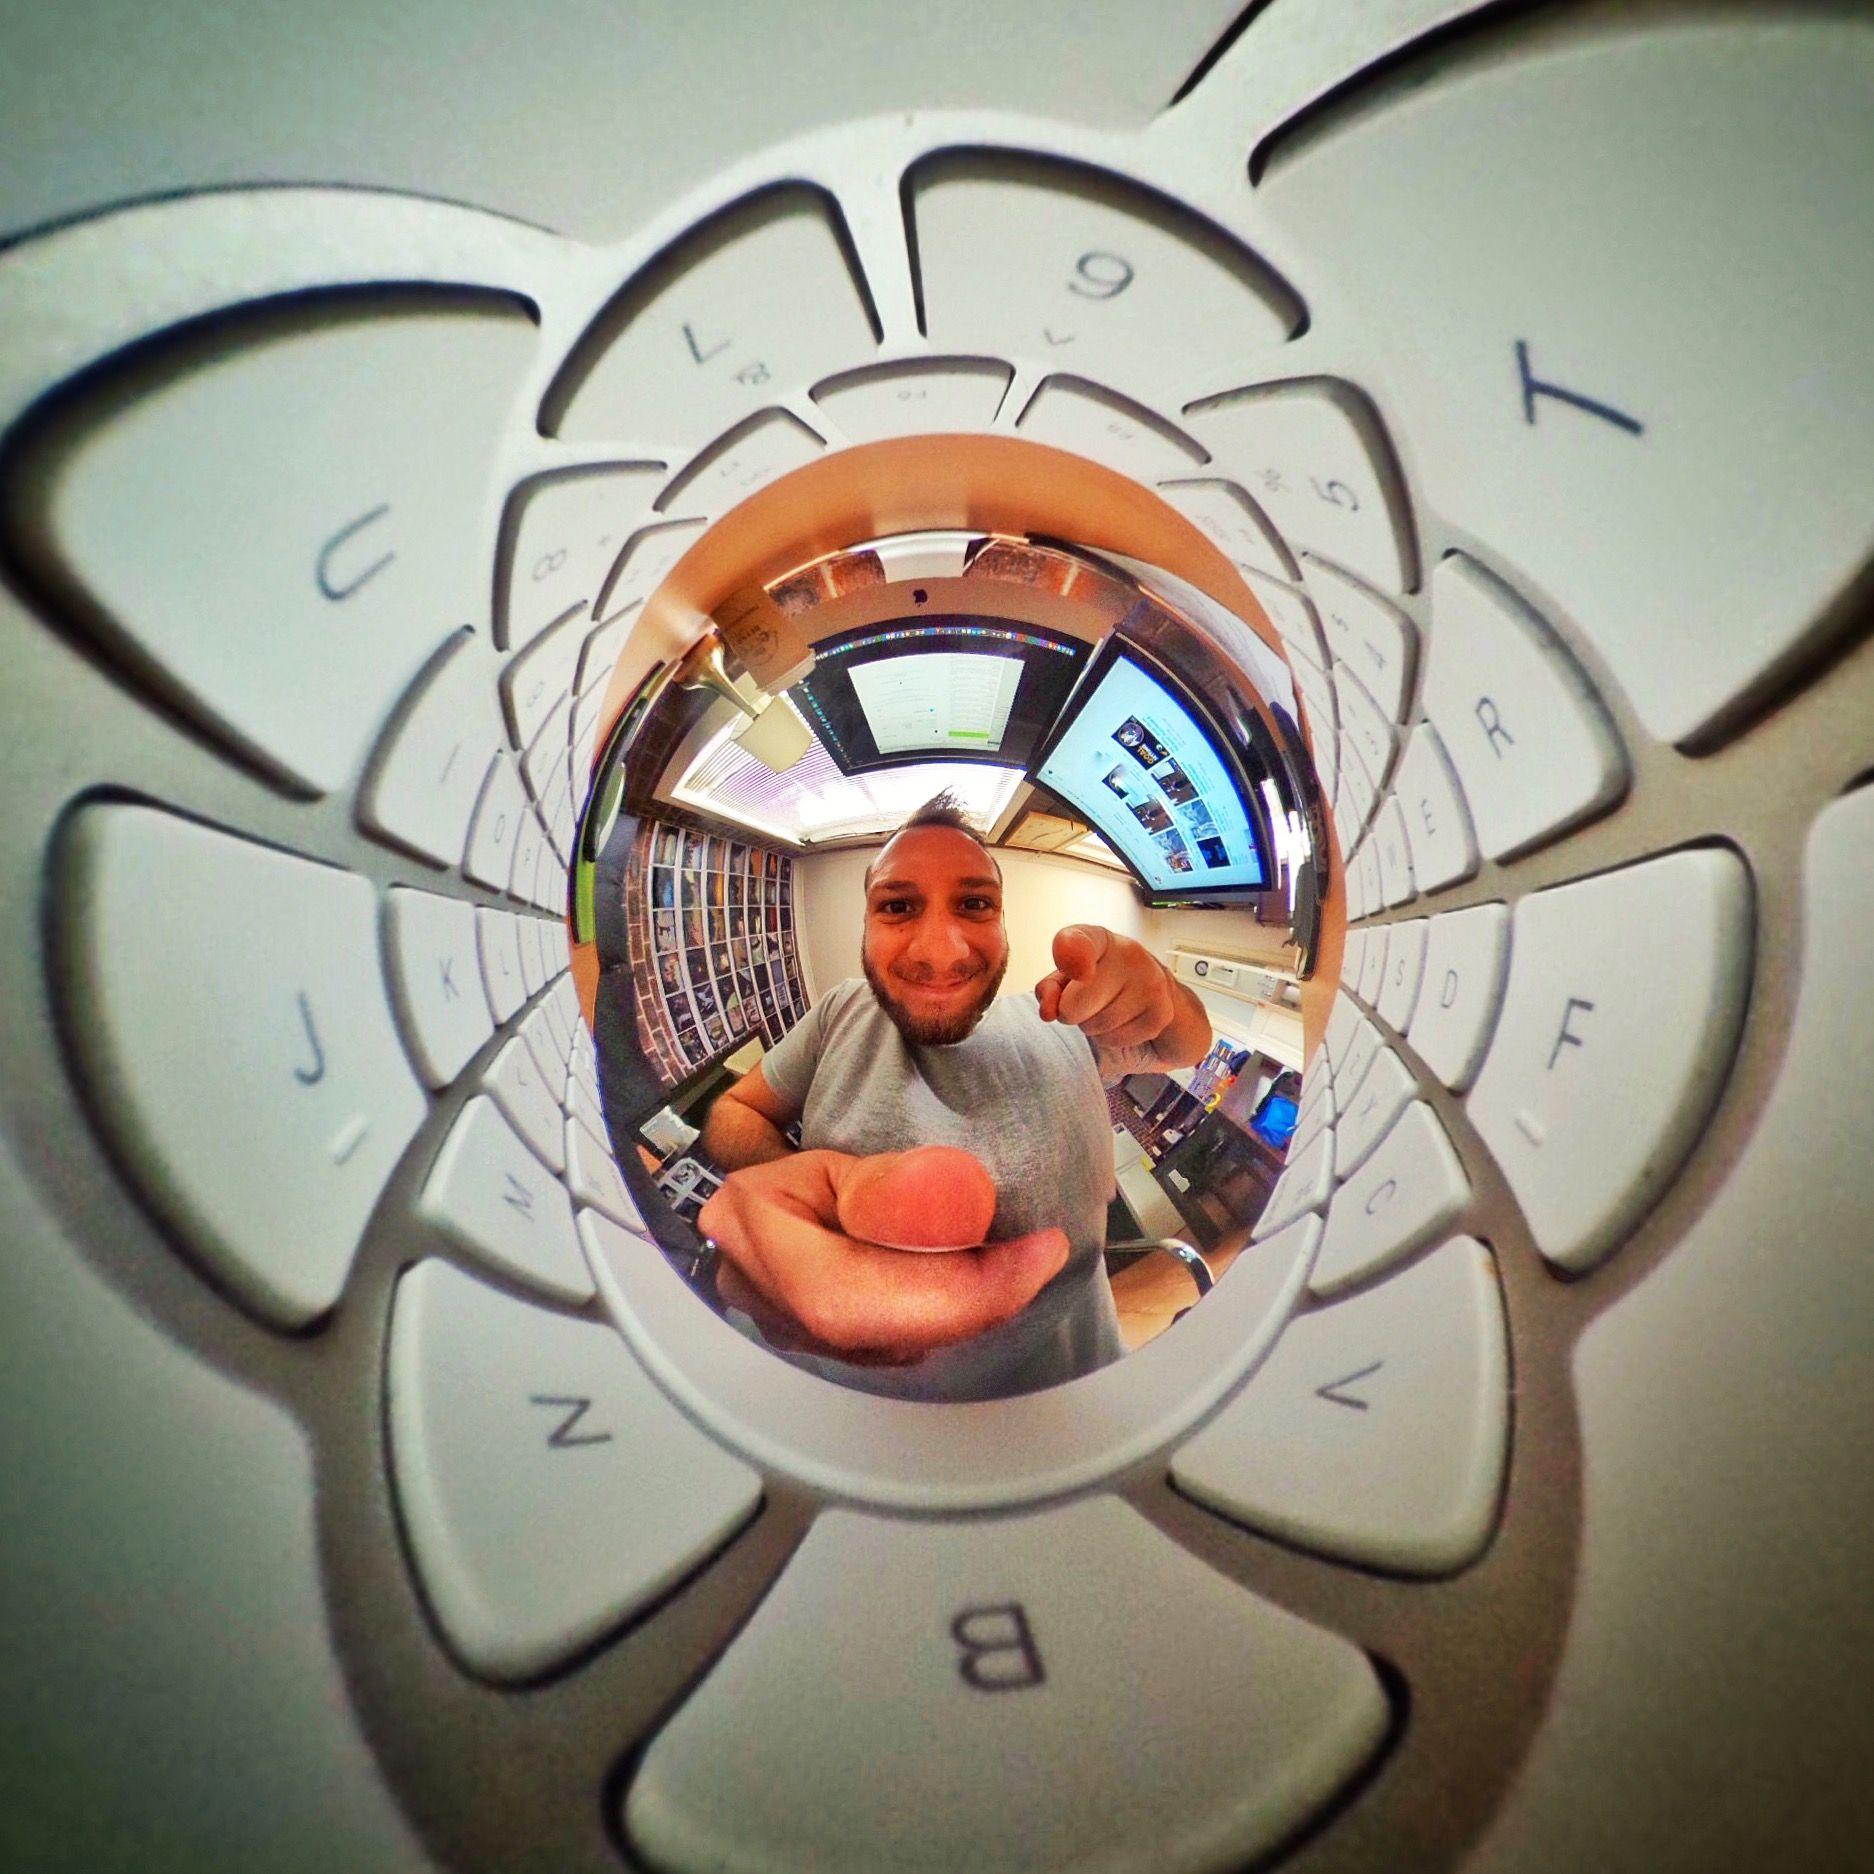 Keyboard Vortex (See more: http://facebook.com/lifein360photo) #mac #computer #vortex #keyboard #360photo #lifein360 #theta360 #tinyplanet